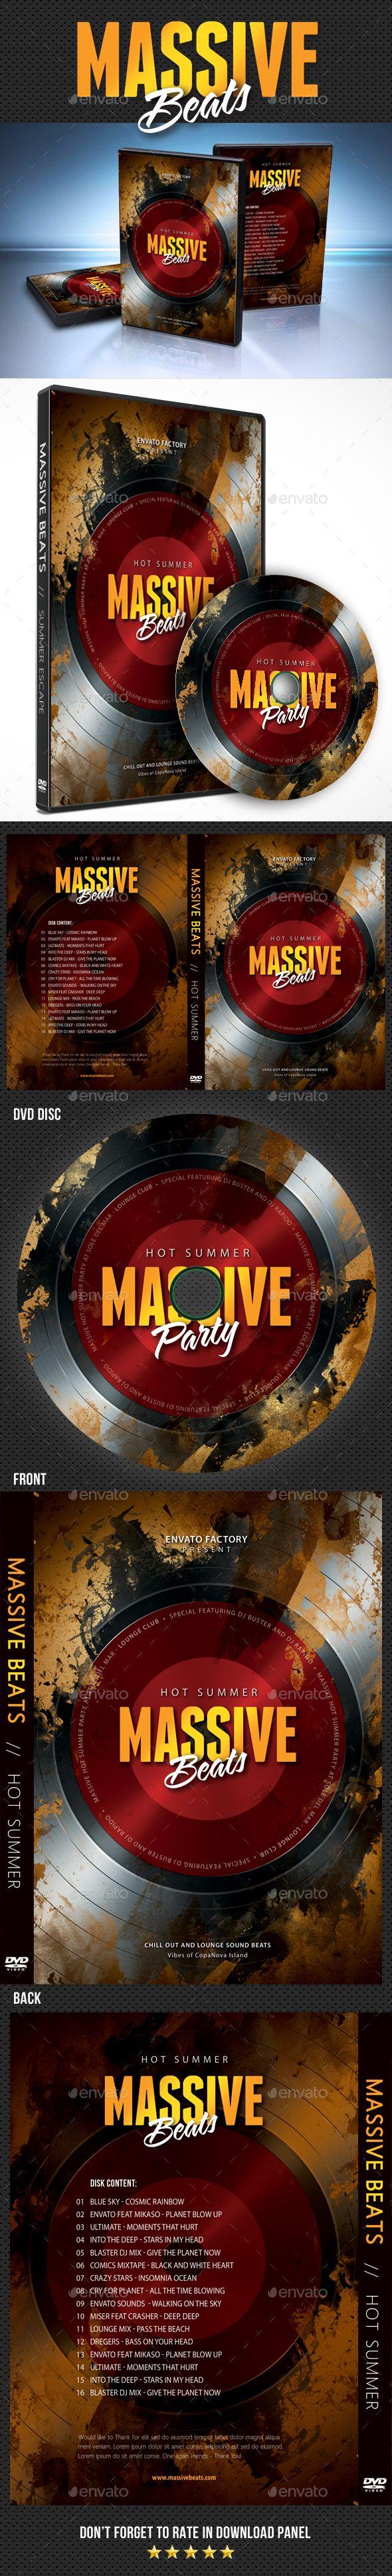 summer grunge party dvd cover template cd dvd artwork print templates